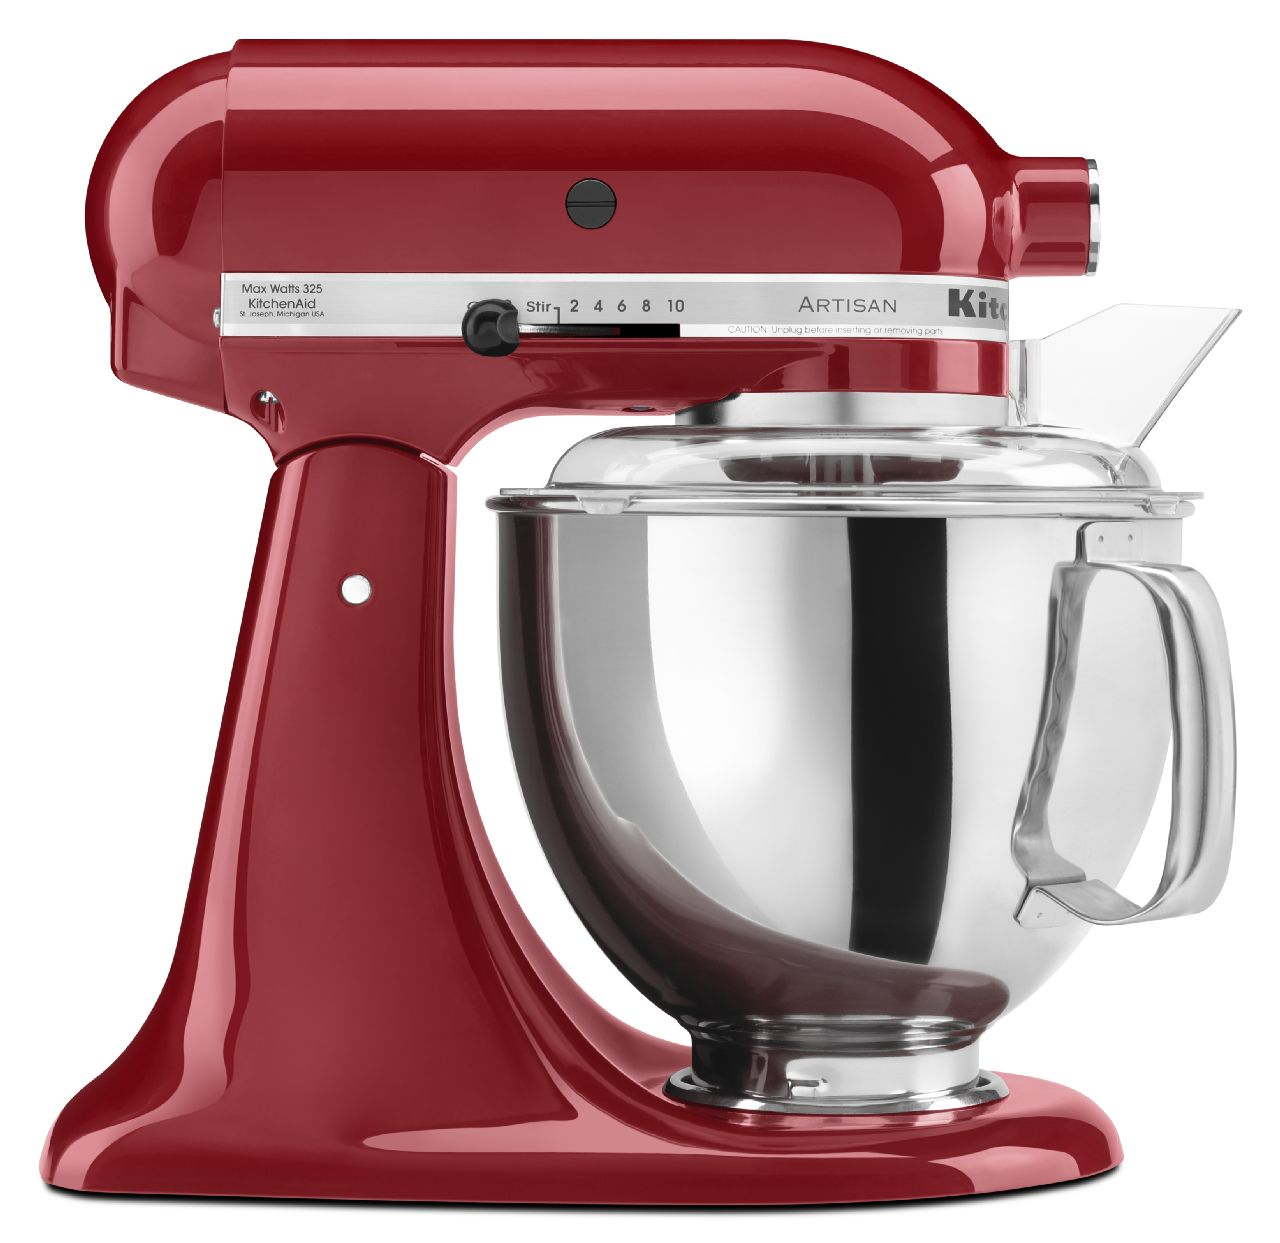 KitchenAid-Artisan-Series-5-Quart-Tilt-Head-Stand-Mixer-10-Speeds-KSM150PS thumbnail 51